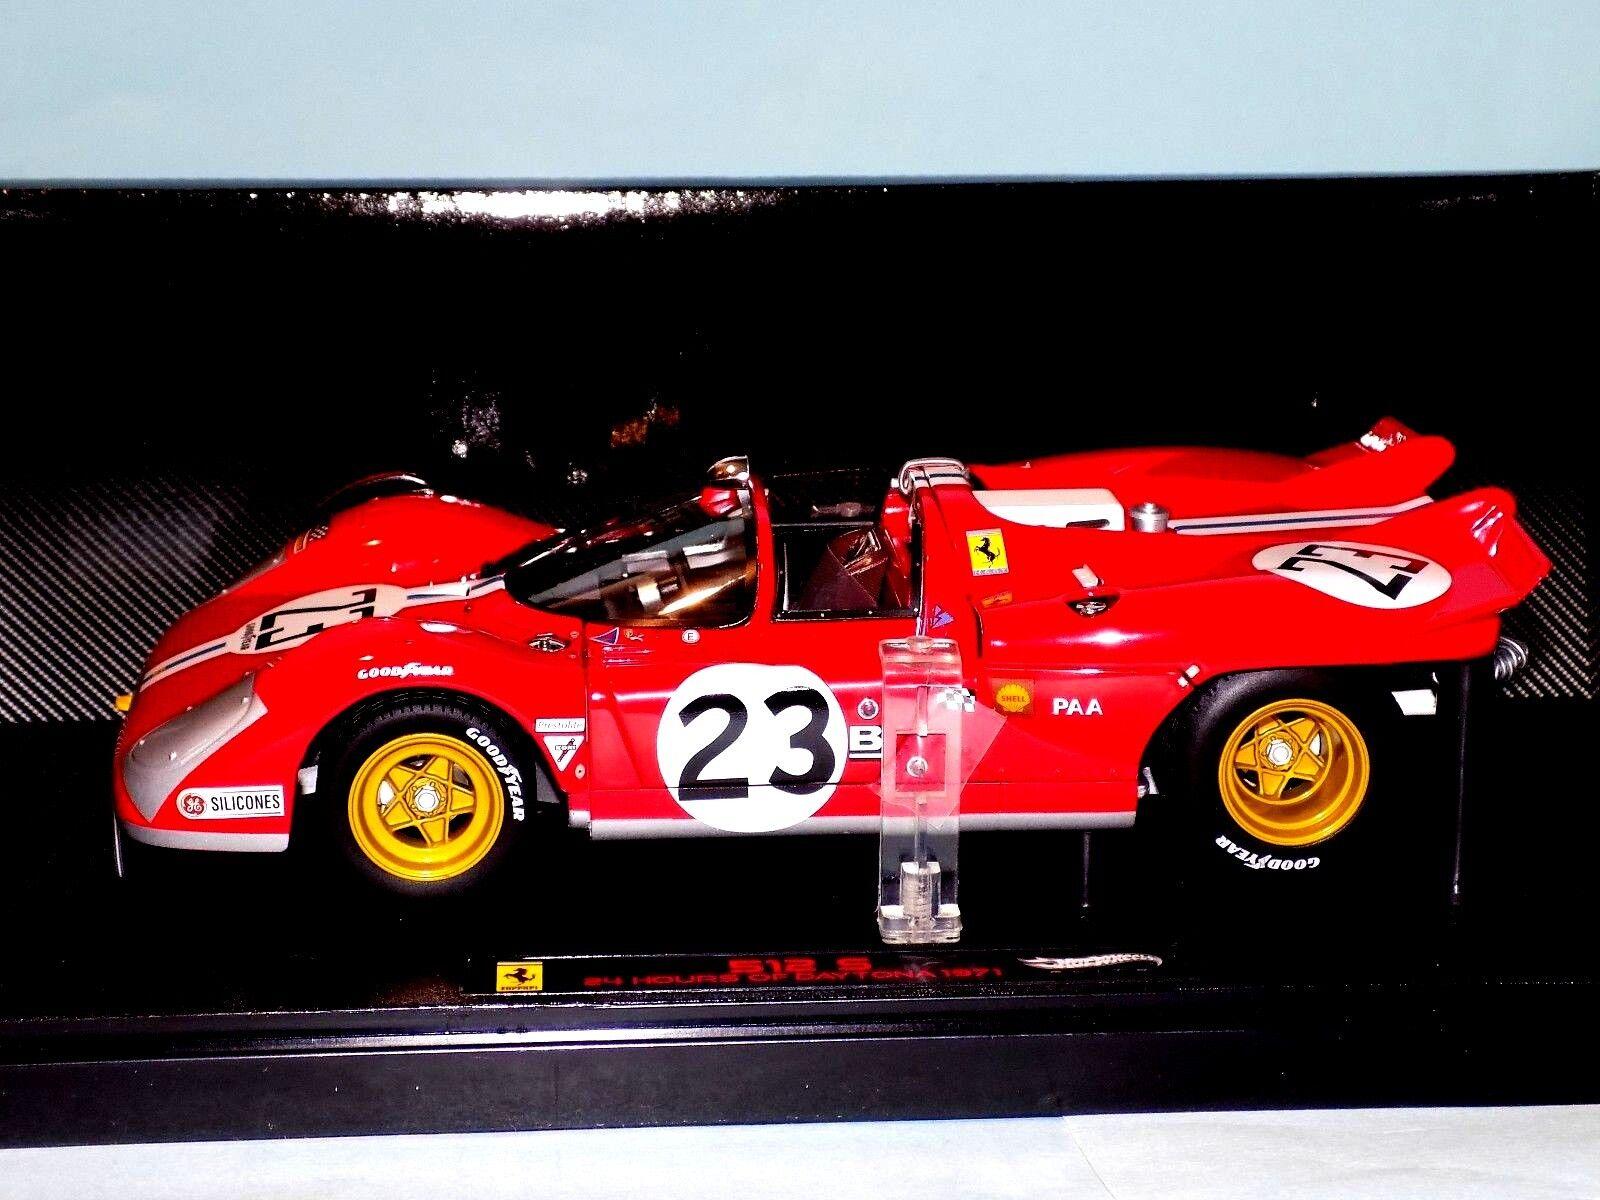 Ferrari 512 s   23 daytona 1971 b.adamovicz elite hot wheels t6930 1,18